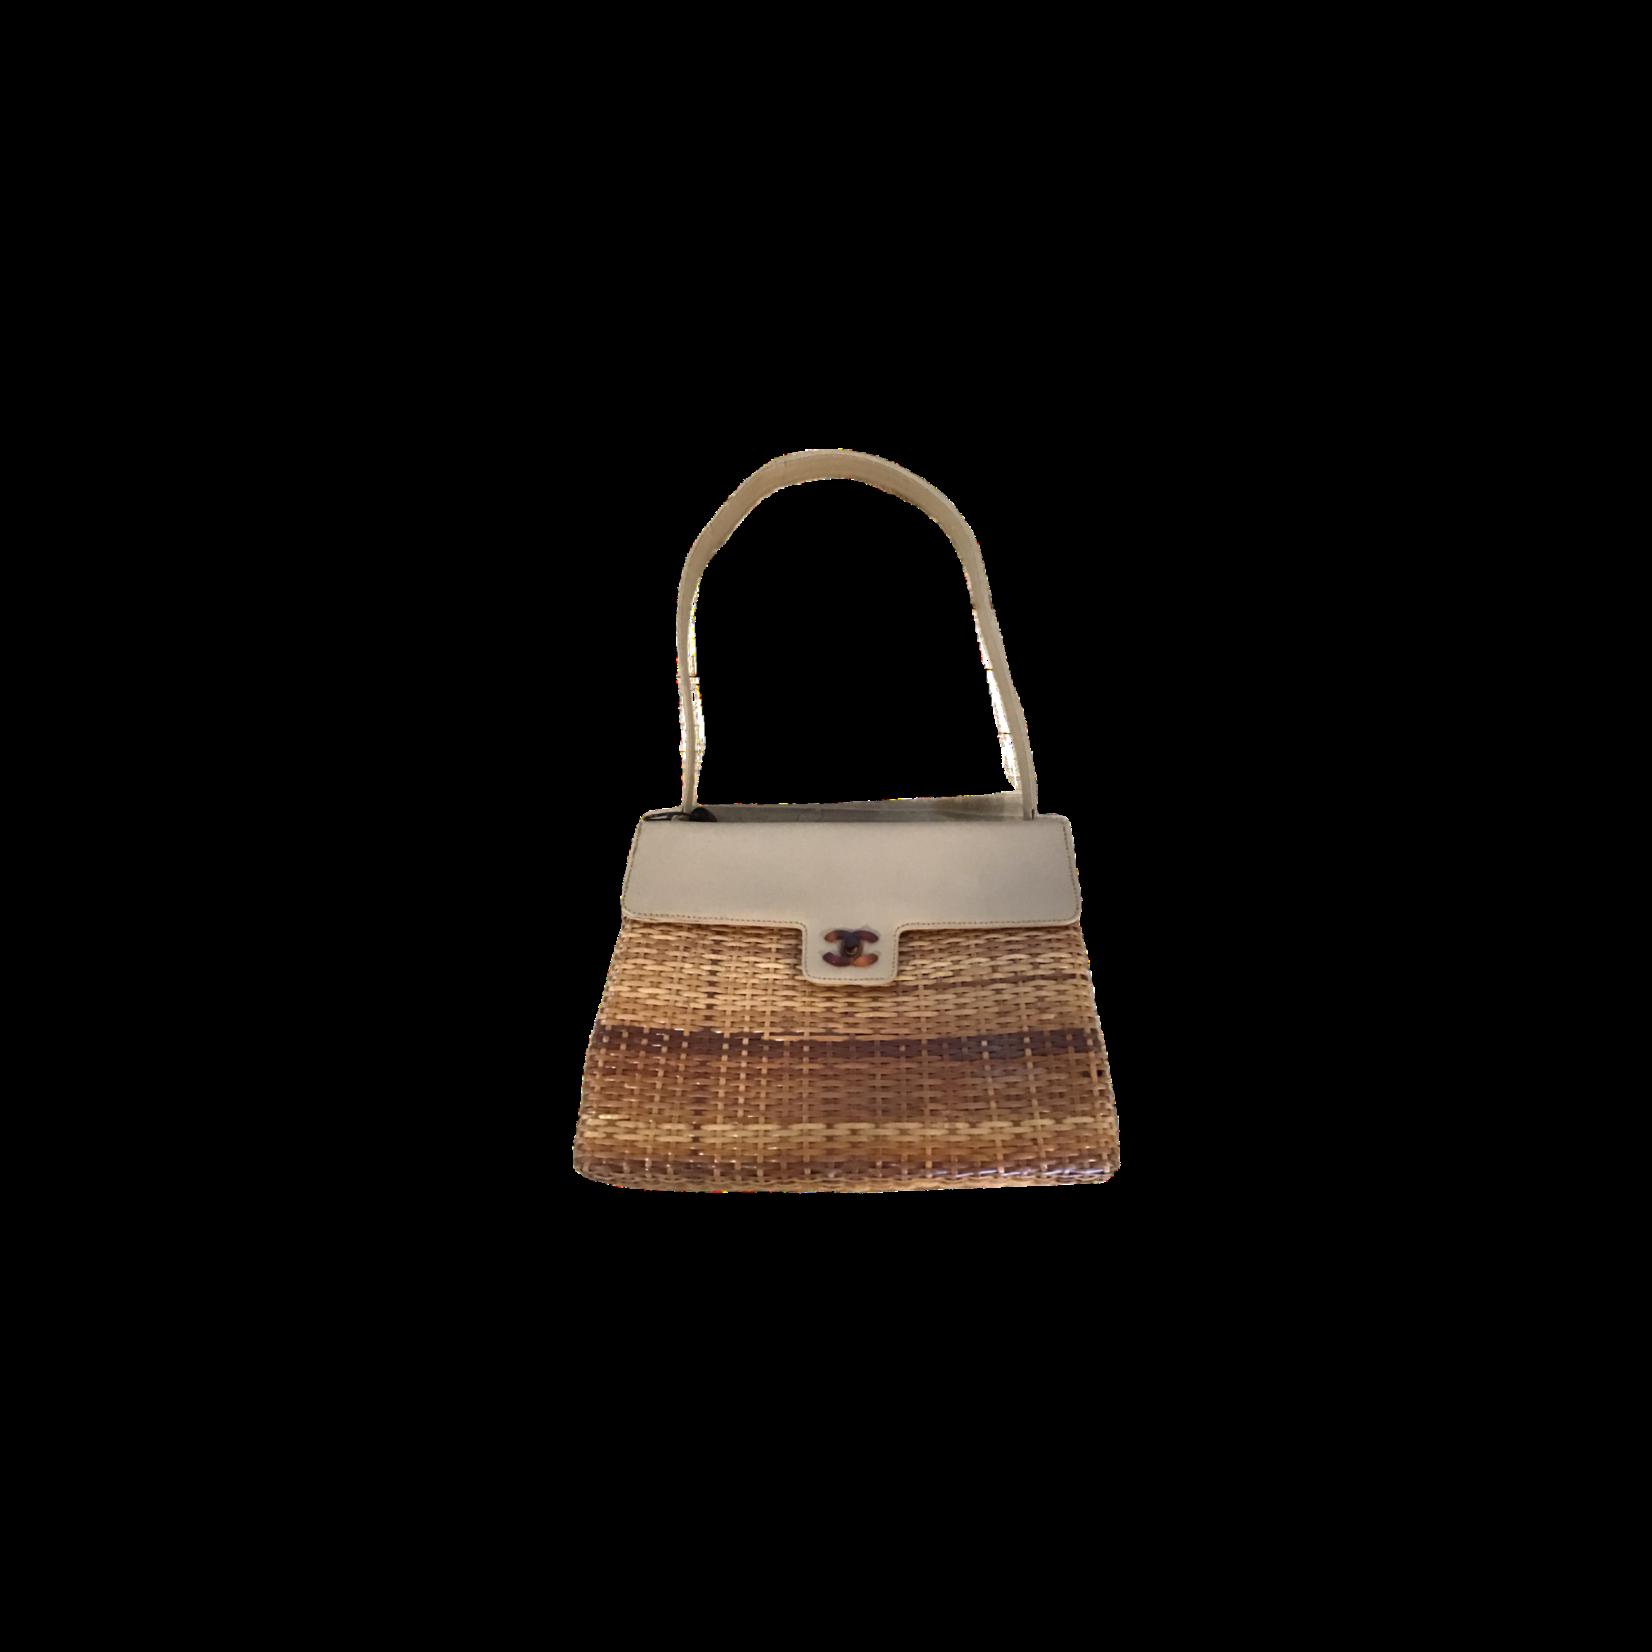 Chanel Chanel Raffia Shoulder Bag